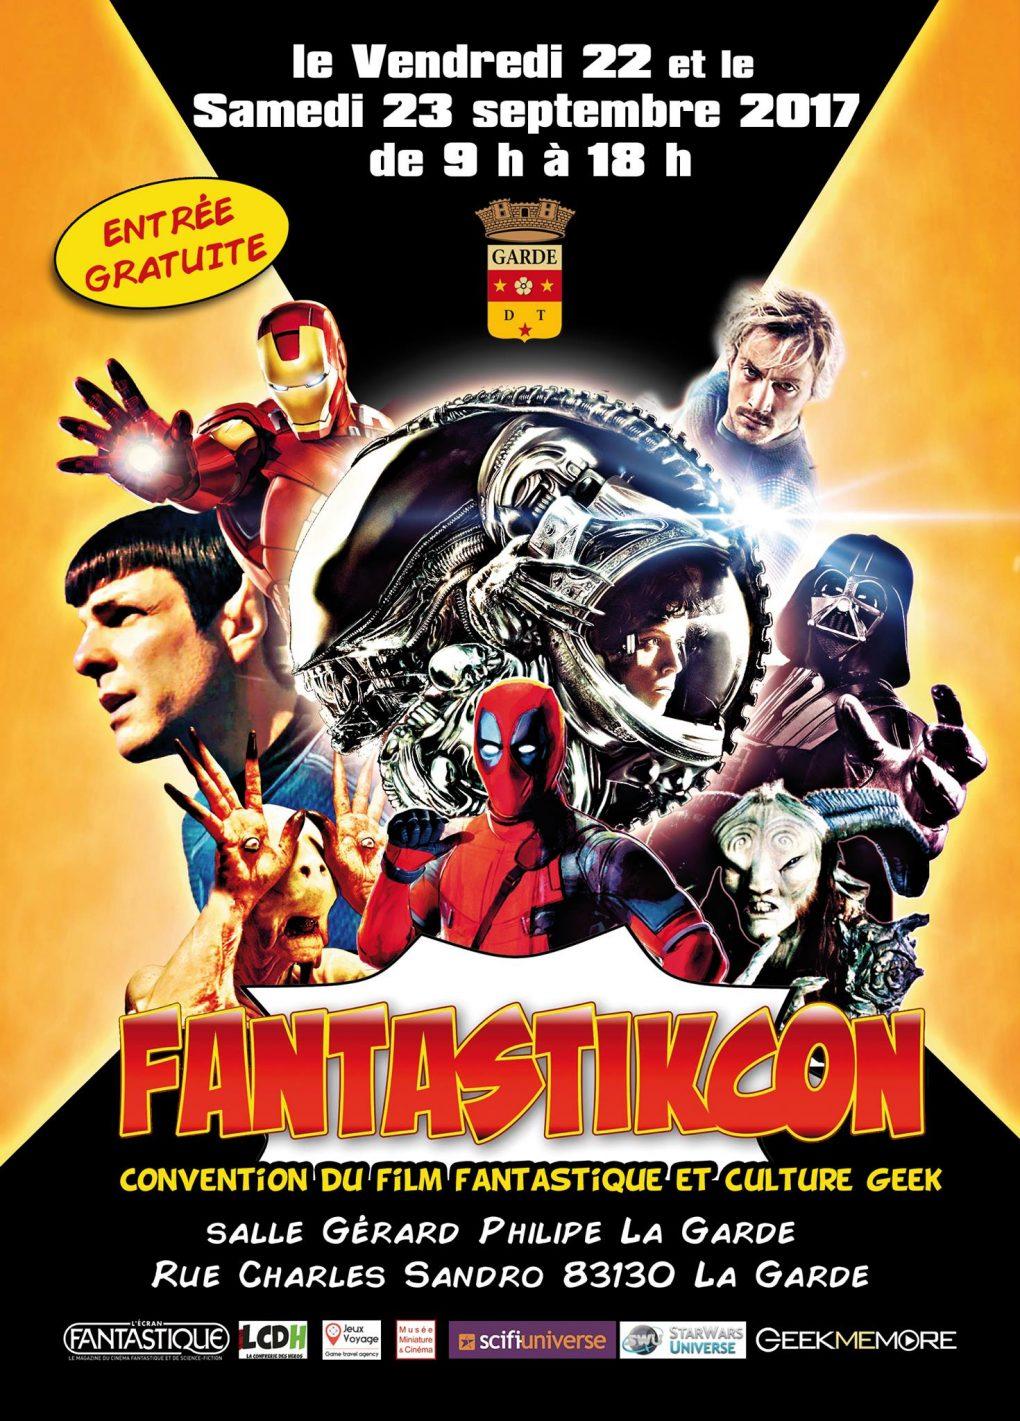 Fantastik Con 2017